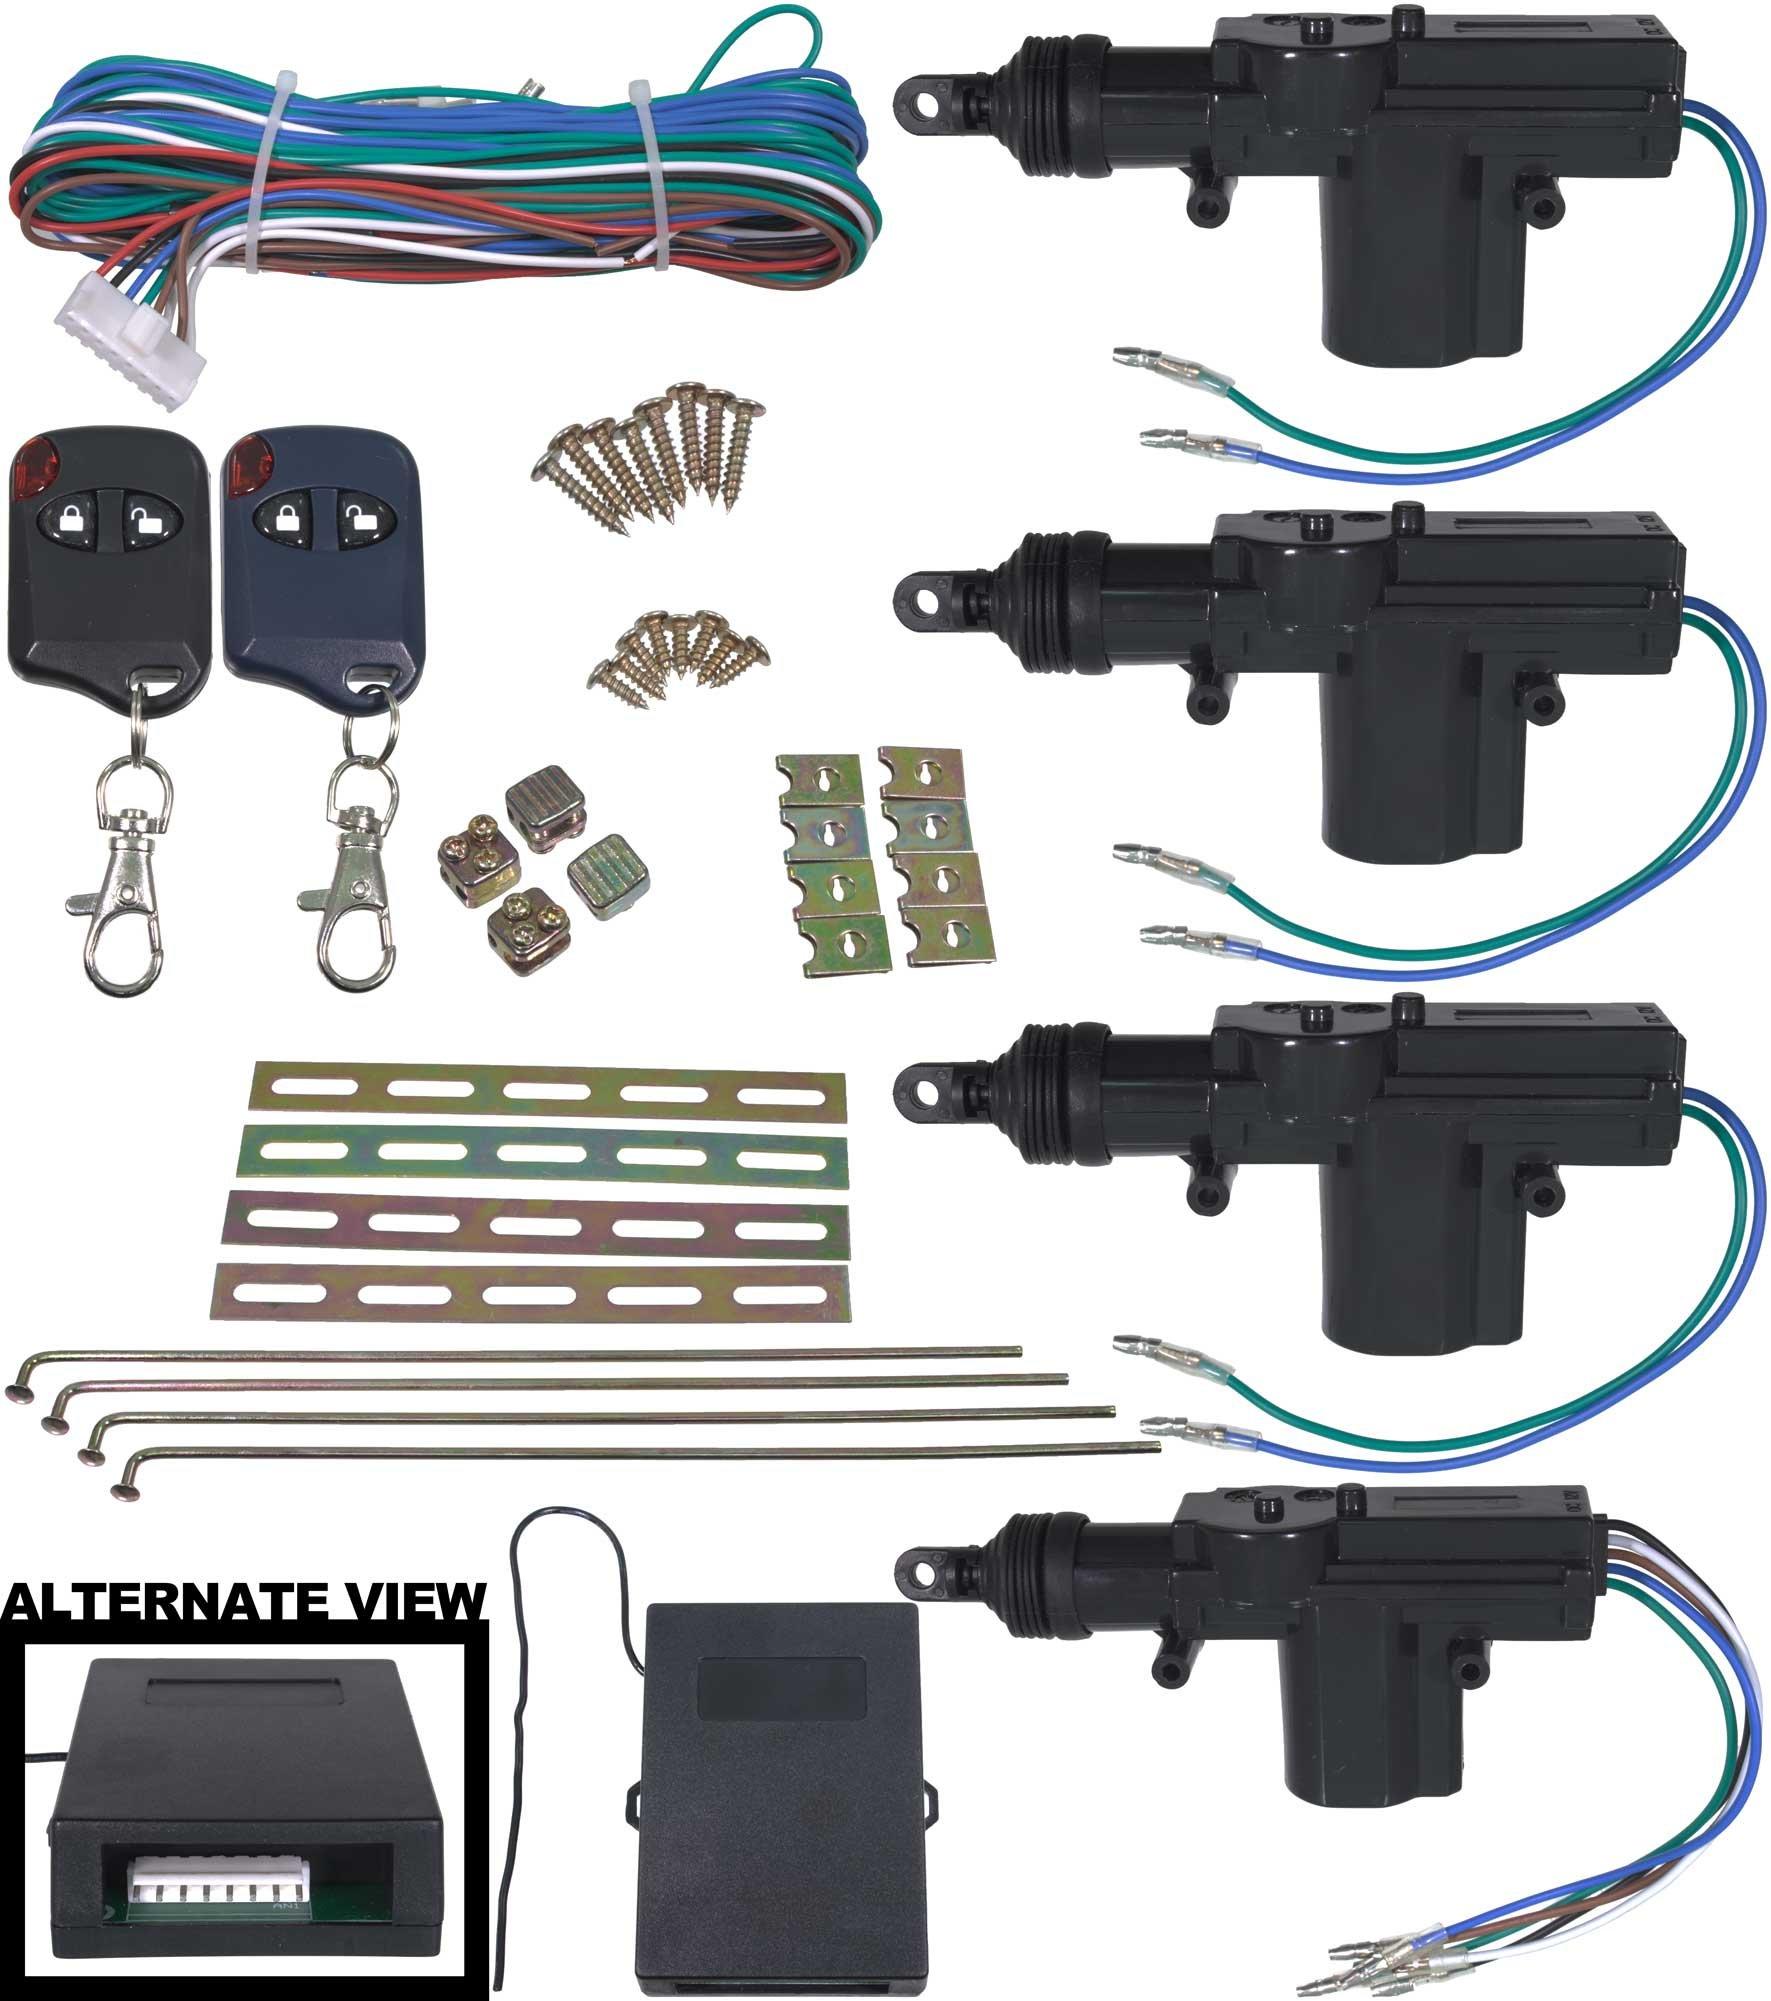 APDTY 133785 Universal Keyless Entry Remote Key Fob Door Lock Actuator Kit